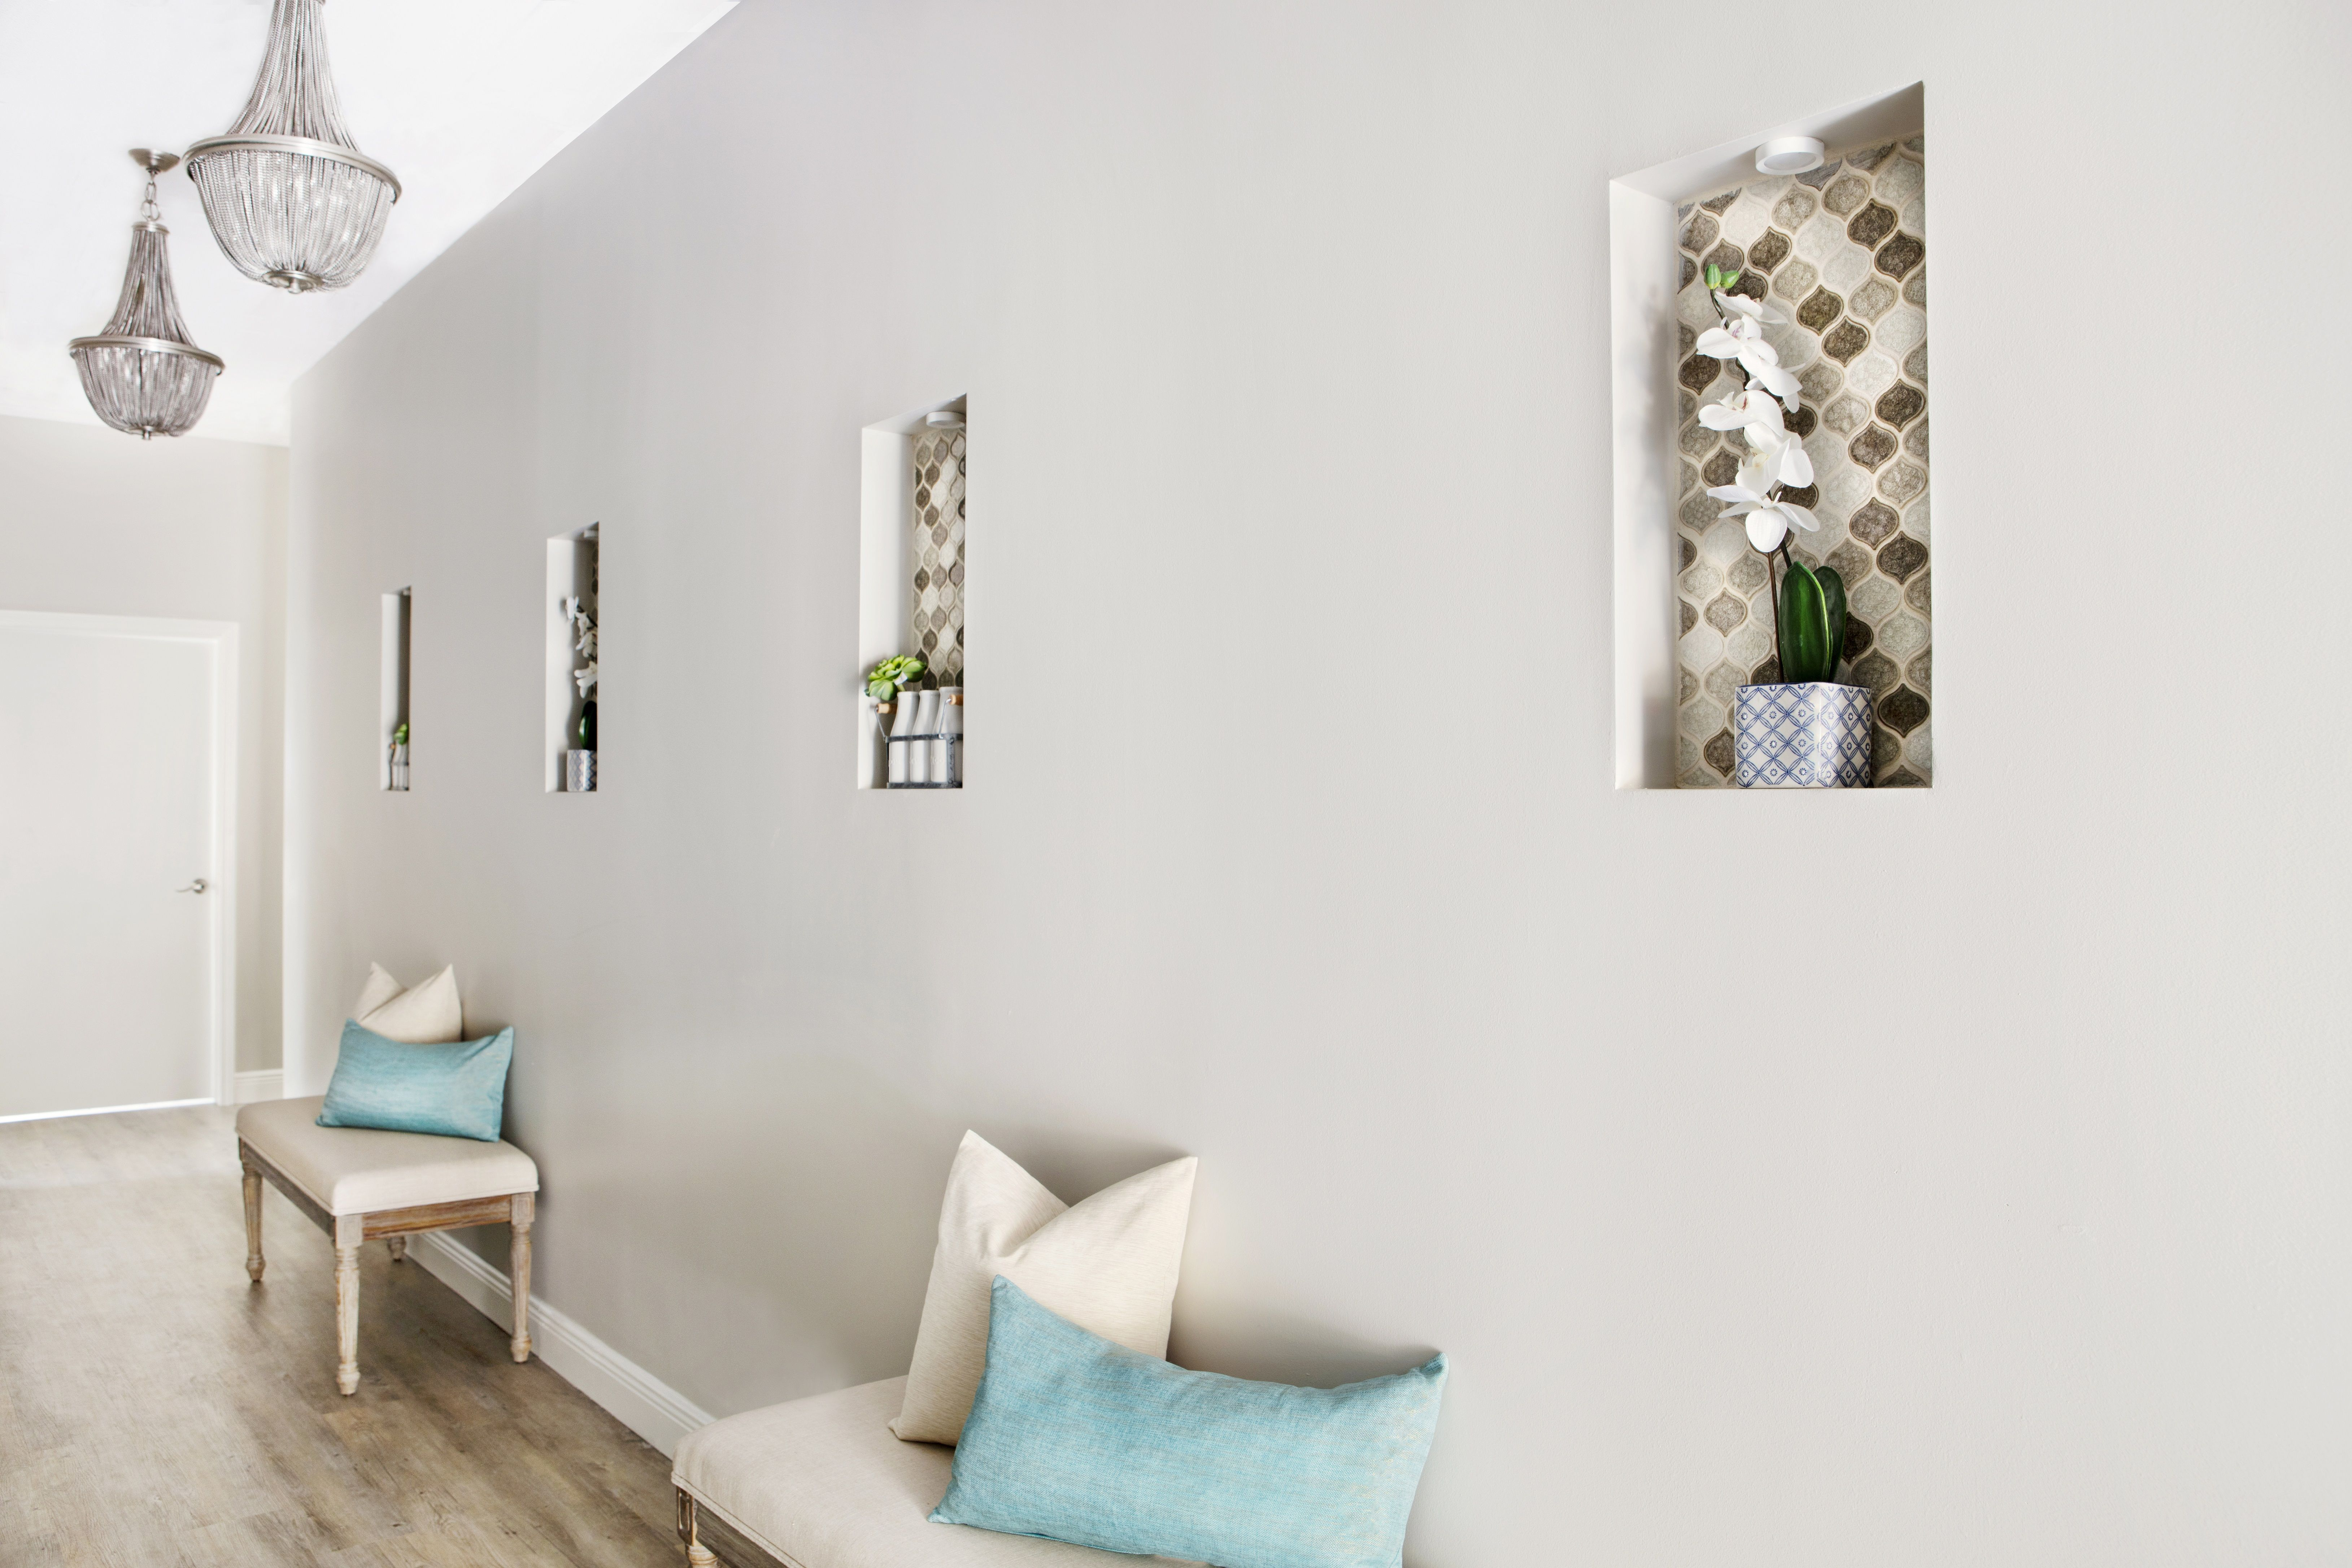 rejuvenate austin medspa by etch design group photography by